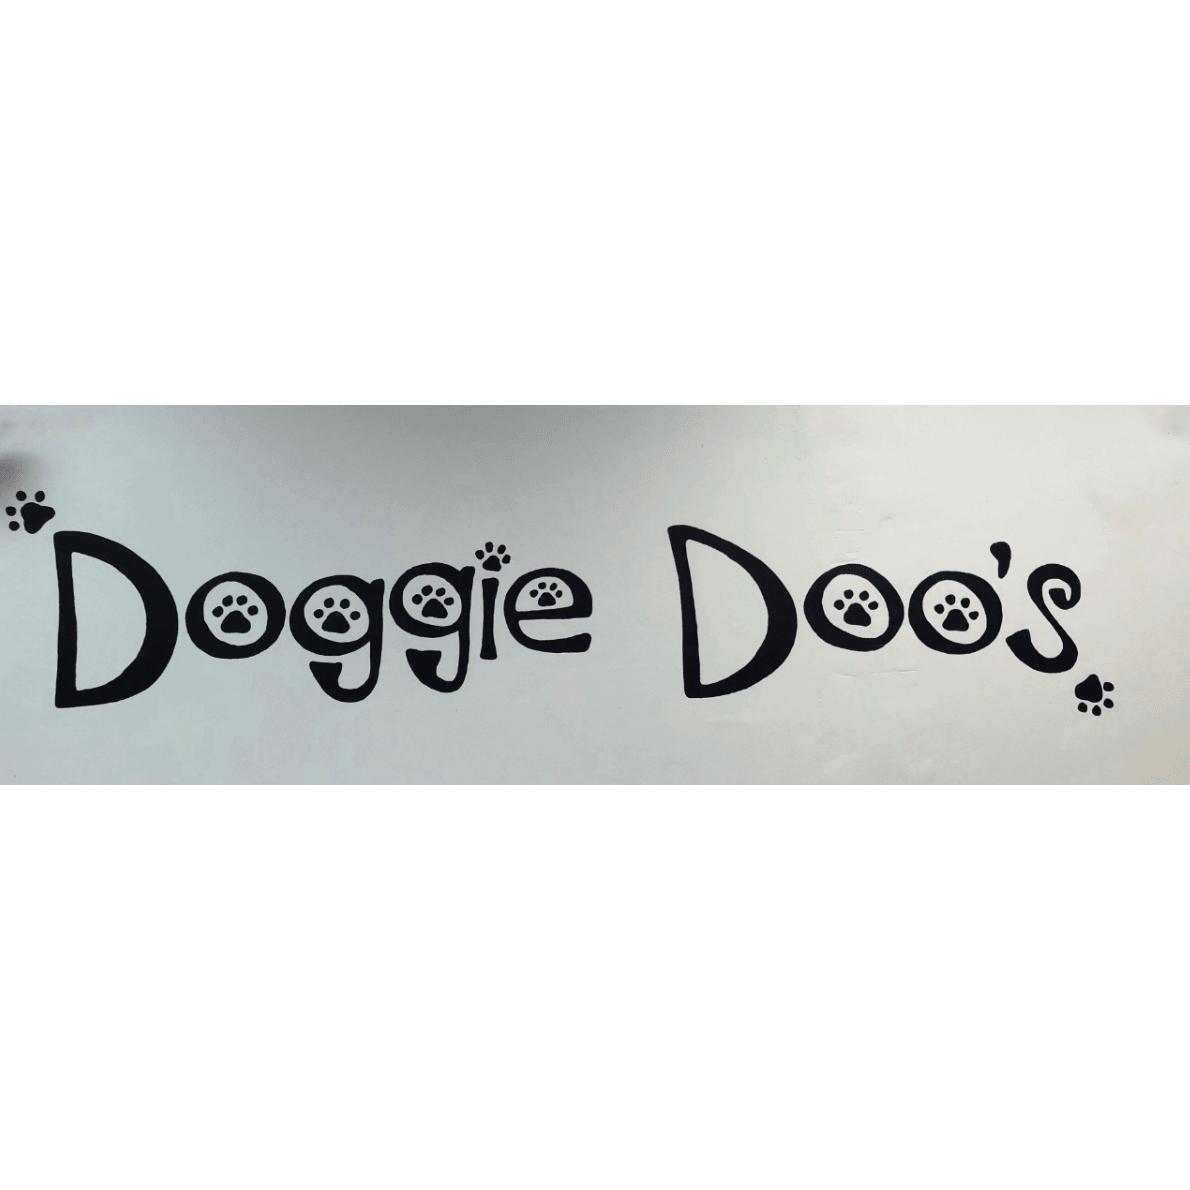 Doggie Doo's Dog Grooming - Jacksonville, FL - Pet Grooming